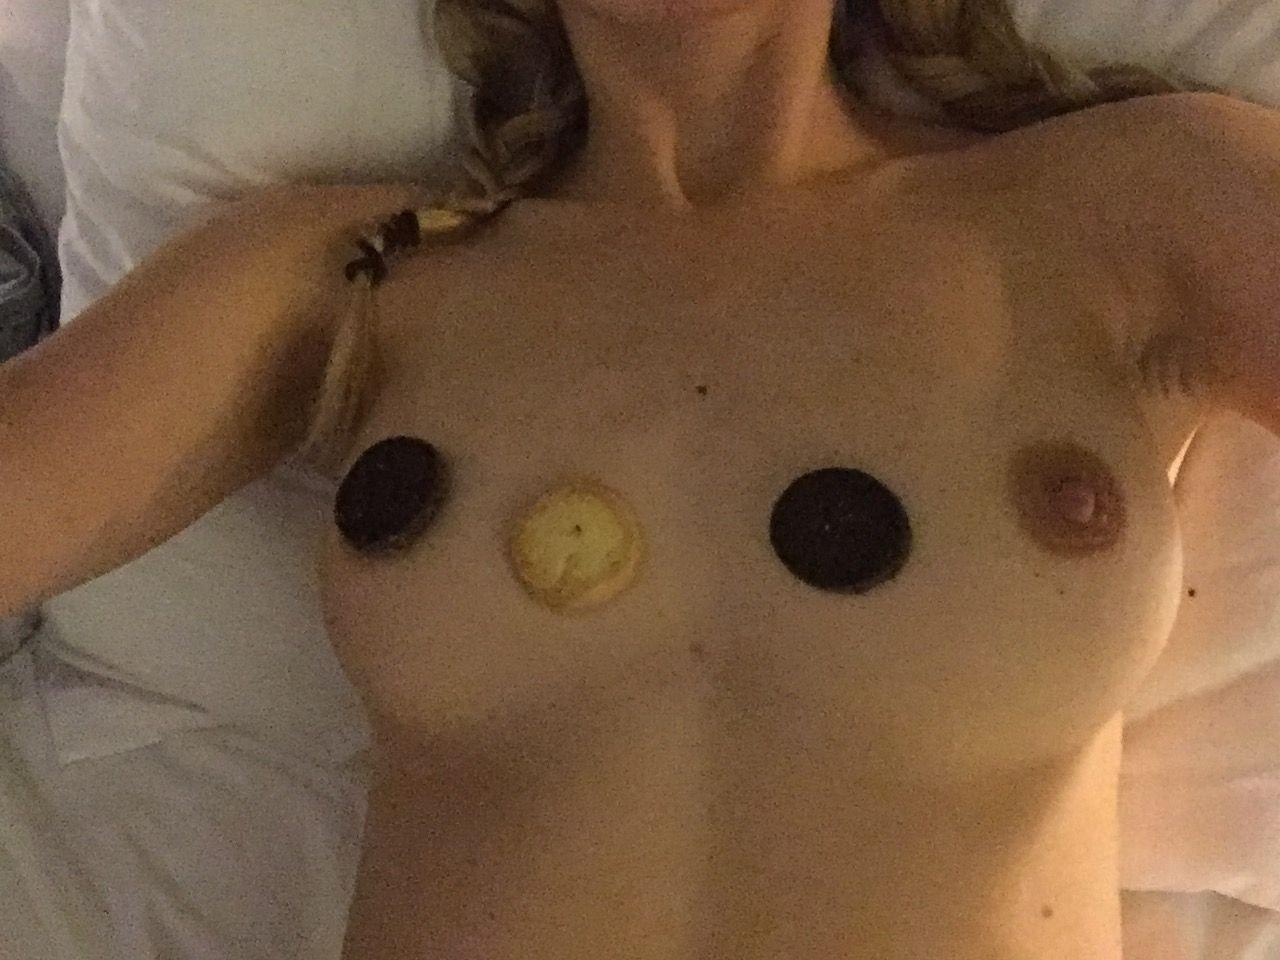 Samara Weaving Nude The Fappening